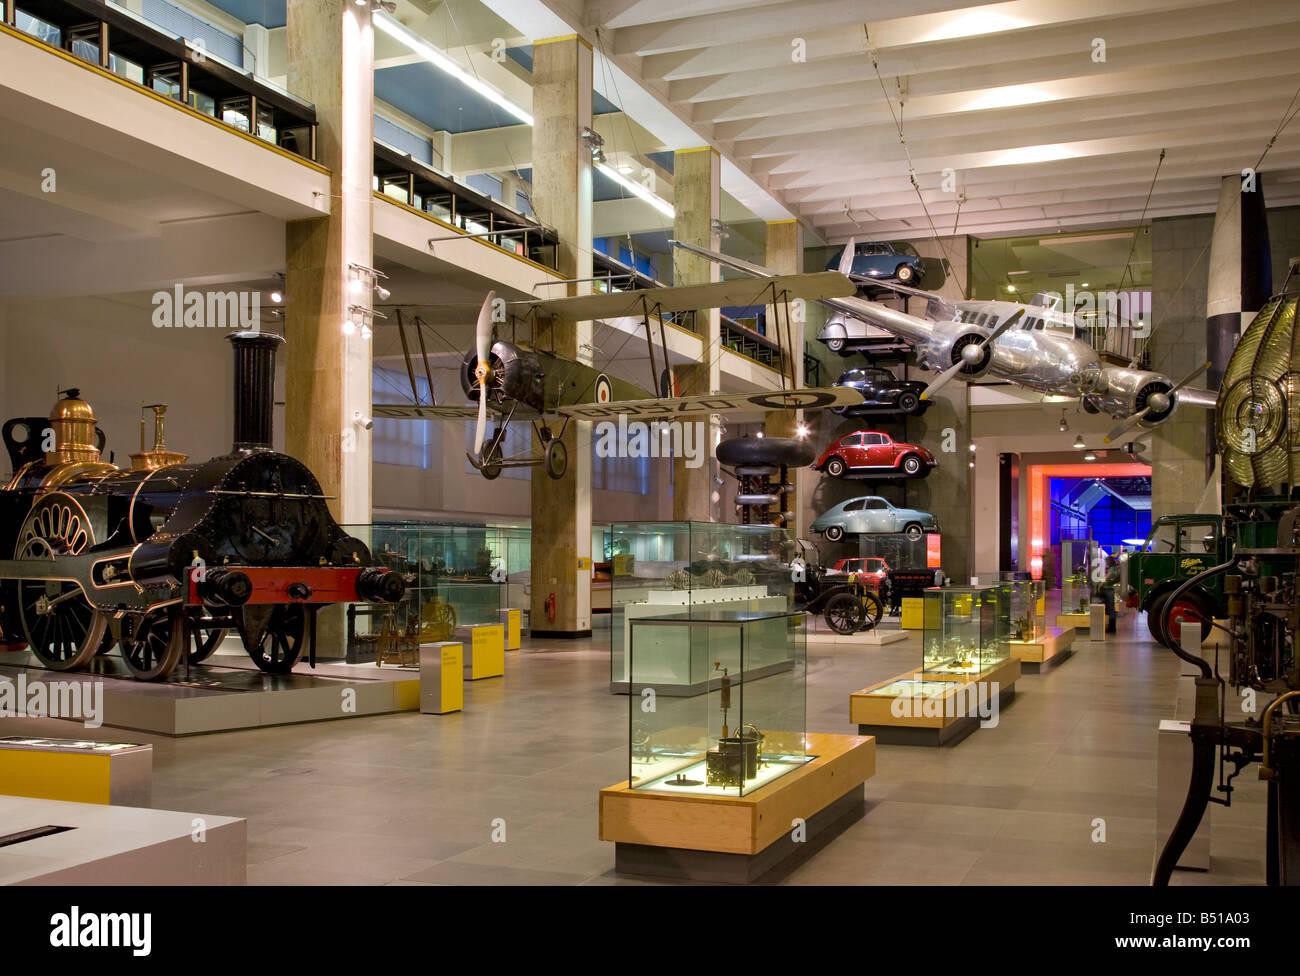 science museum London , England. - Stock Image